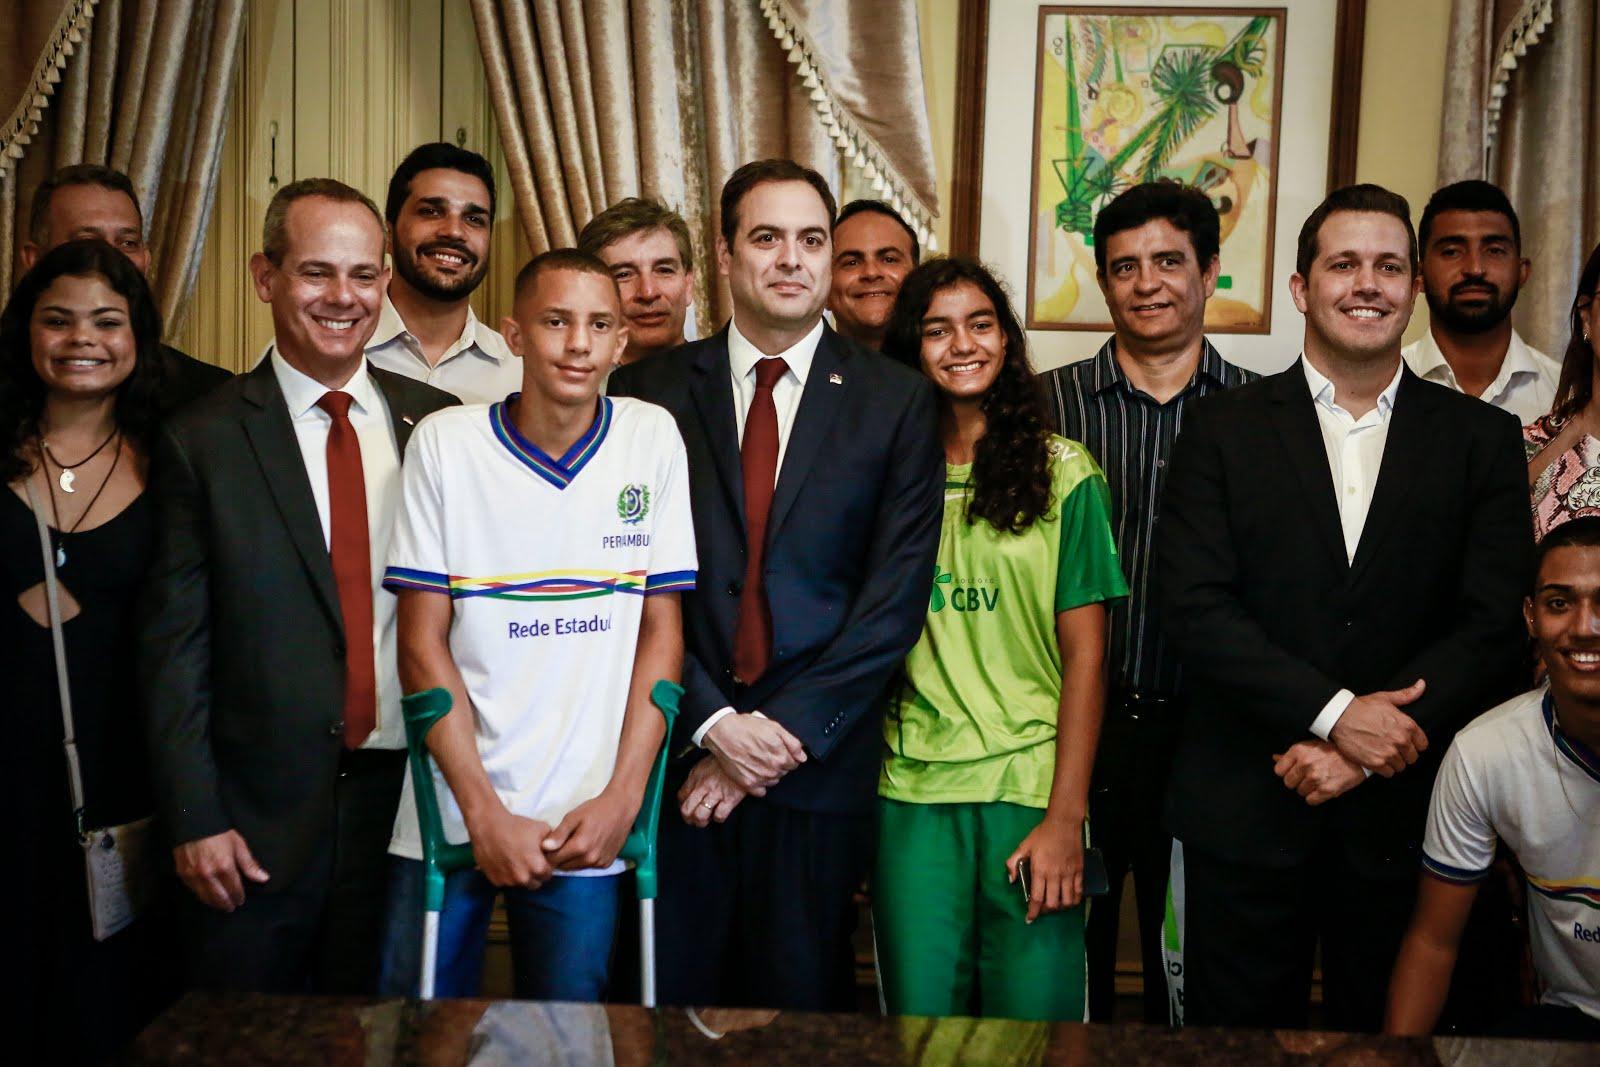 Governo de Pernambuco amplia programas de incentivo ao esporte no Estado